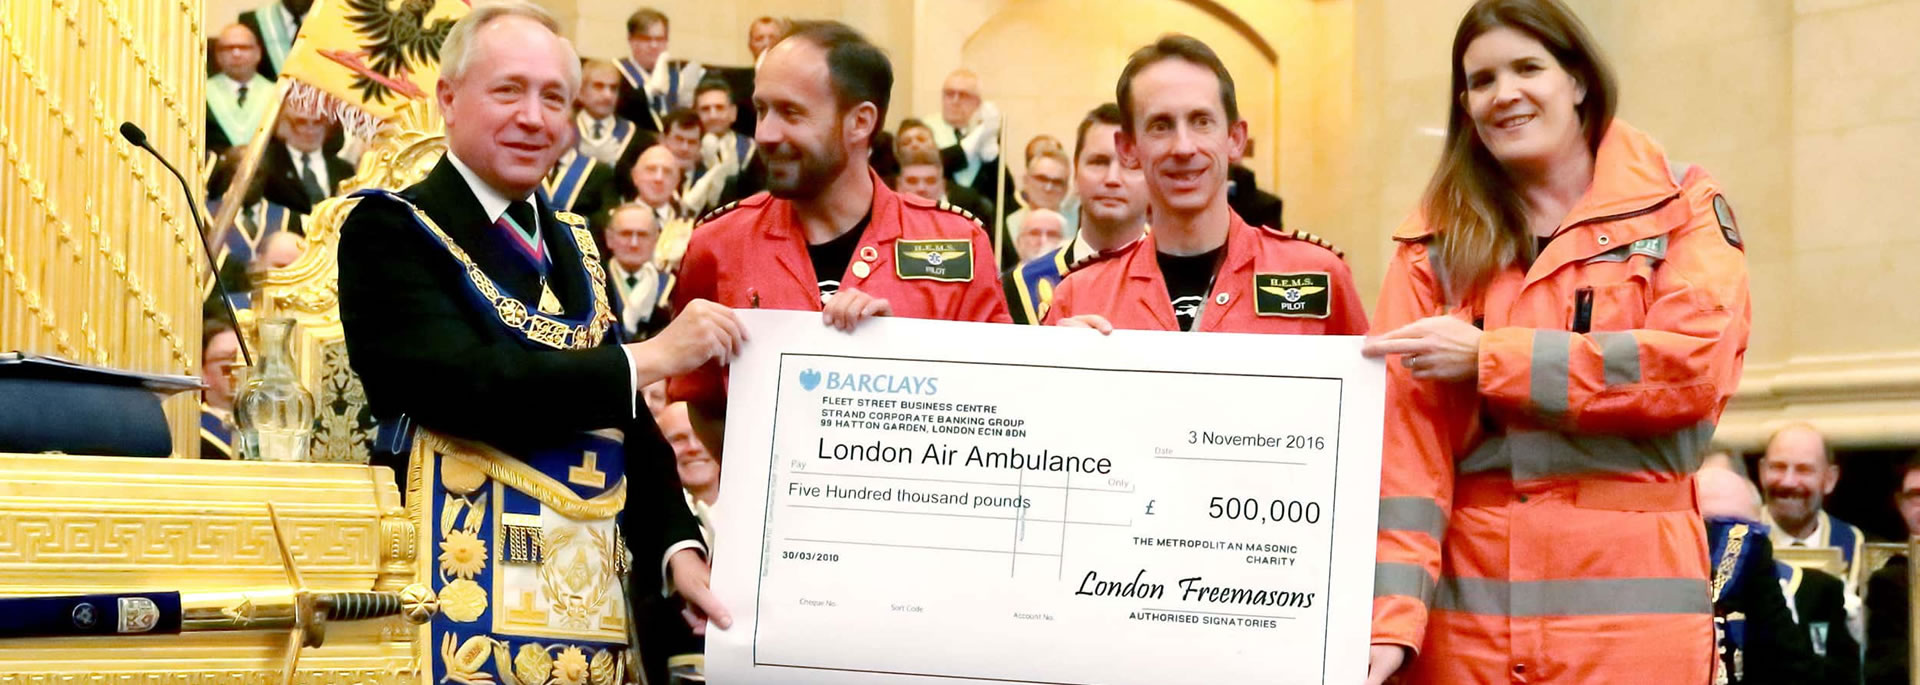 Freemasons Donation to London Air Ambulance